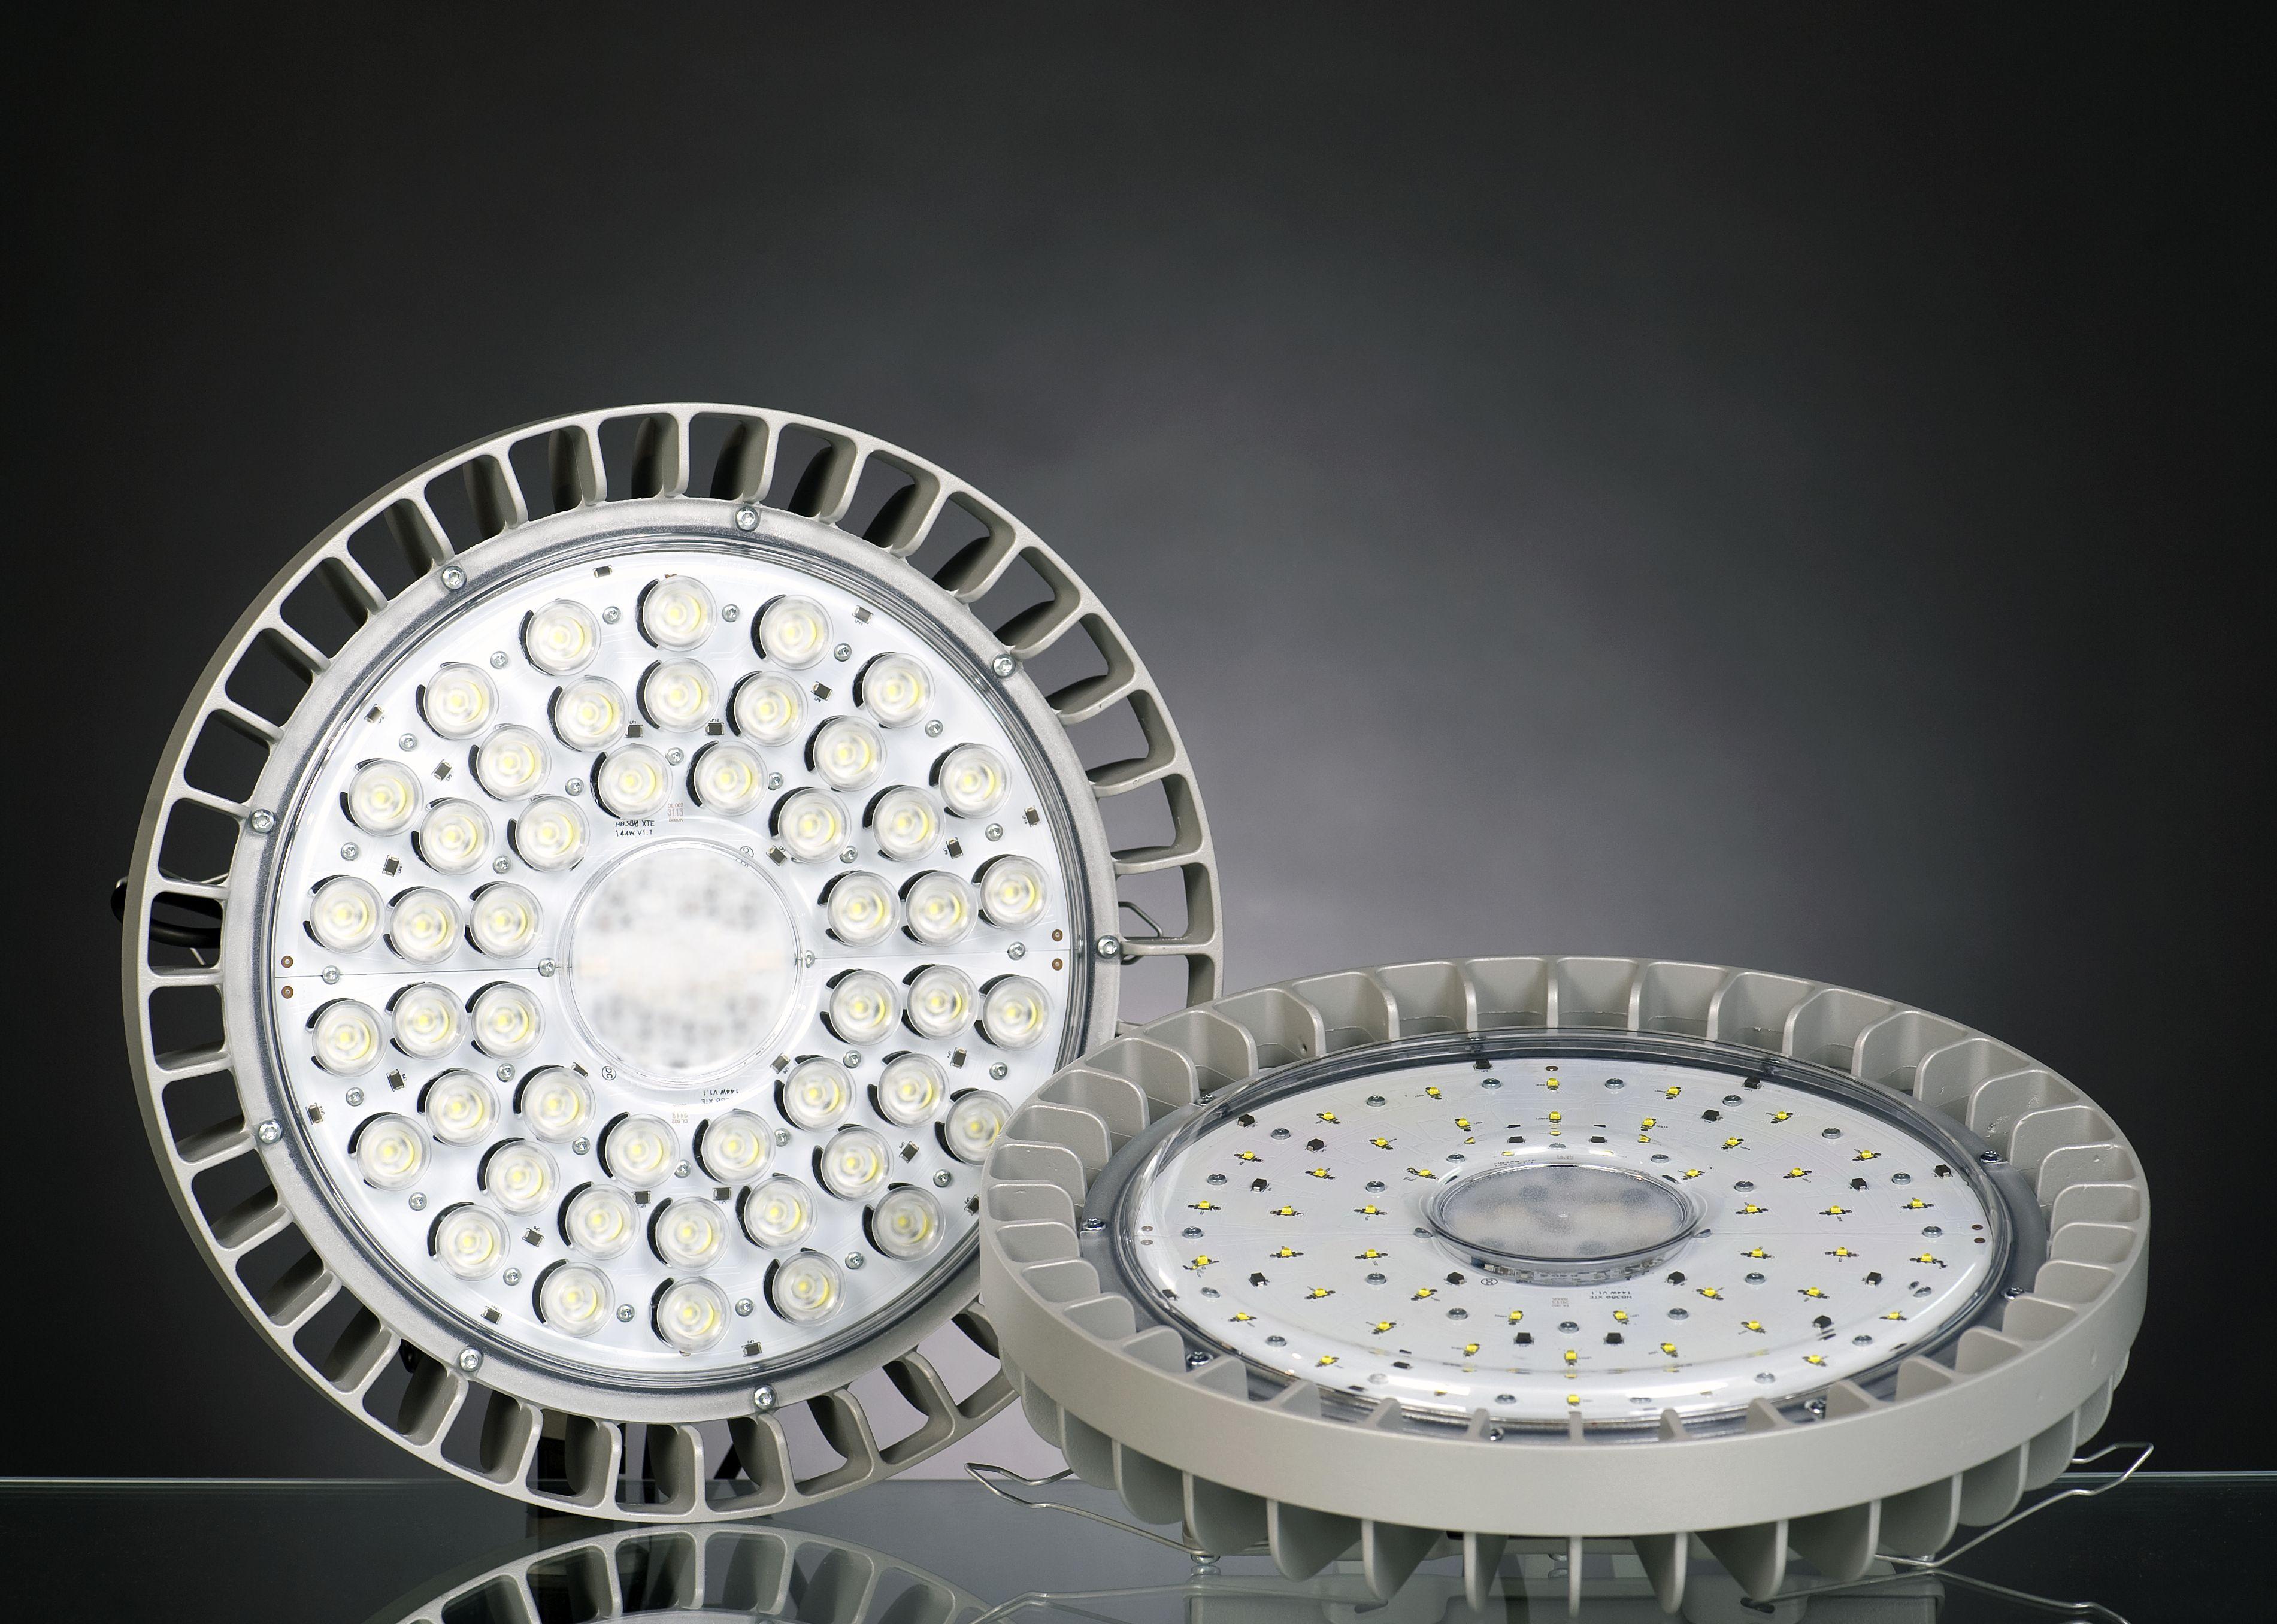 1 Stk Arktur Round LED 115W, 11900lm, 6000K, 40°, 1...10V LIHB119040